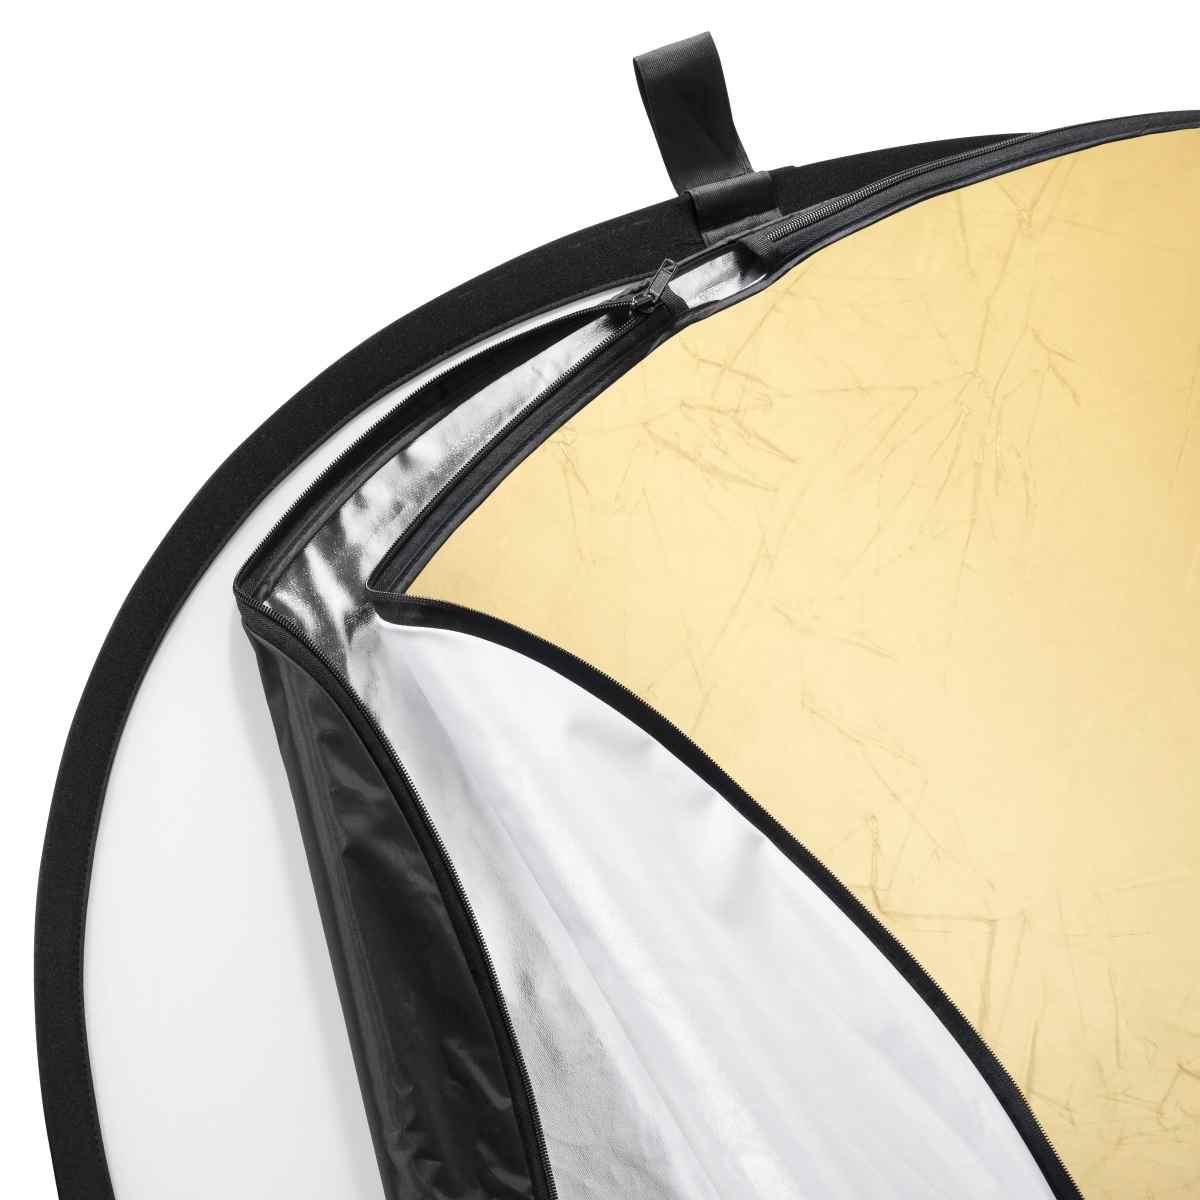 Walimex 5in1 Foldable Reflector Set, 145x196cm